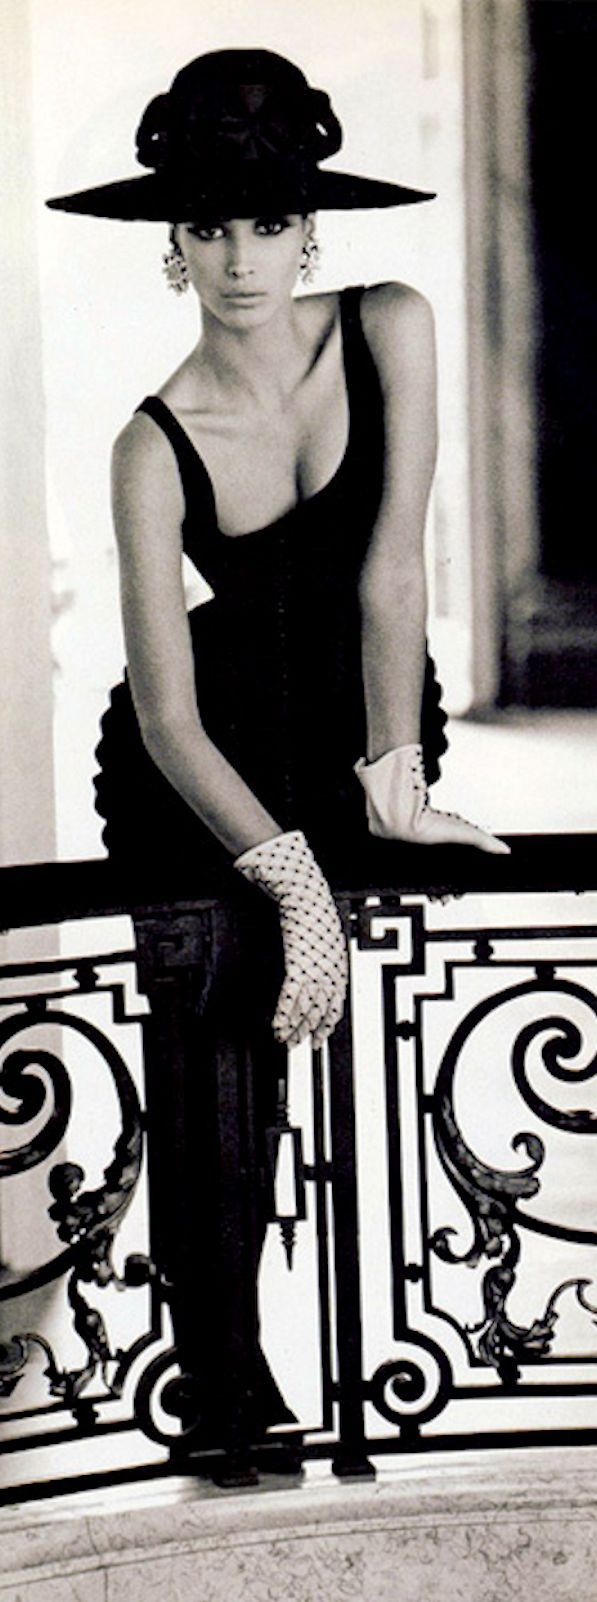 Christy Turlington, in Valentino, September 1991, Vogue Italia, Photo by Steven Meisel